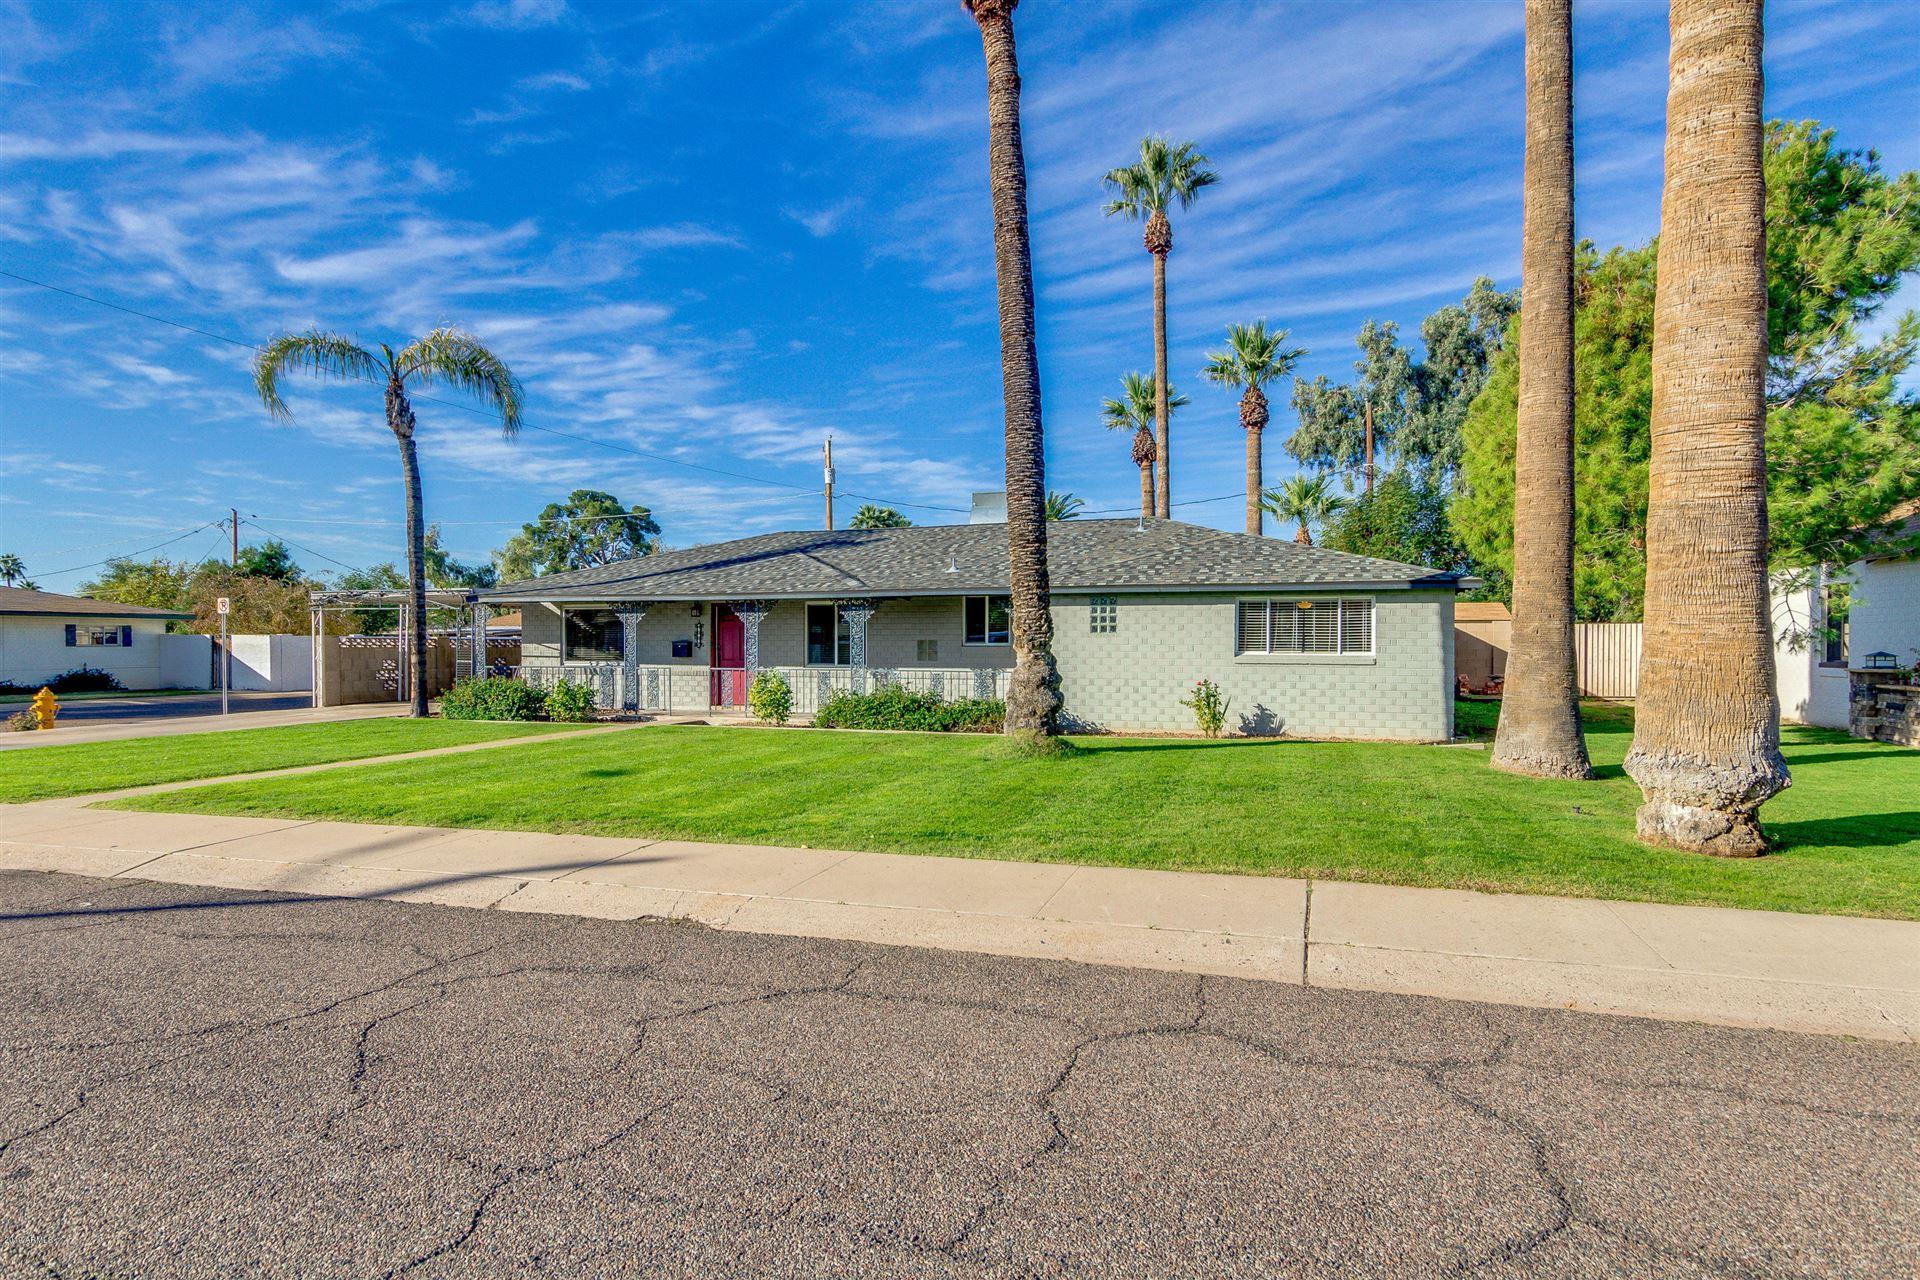 4002 N 33RD Street, Phoenix, AZ 85018 - MLS#: 6015276